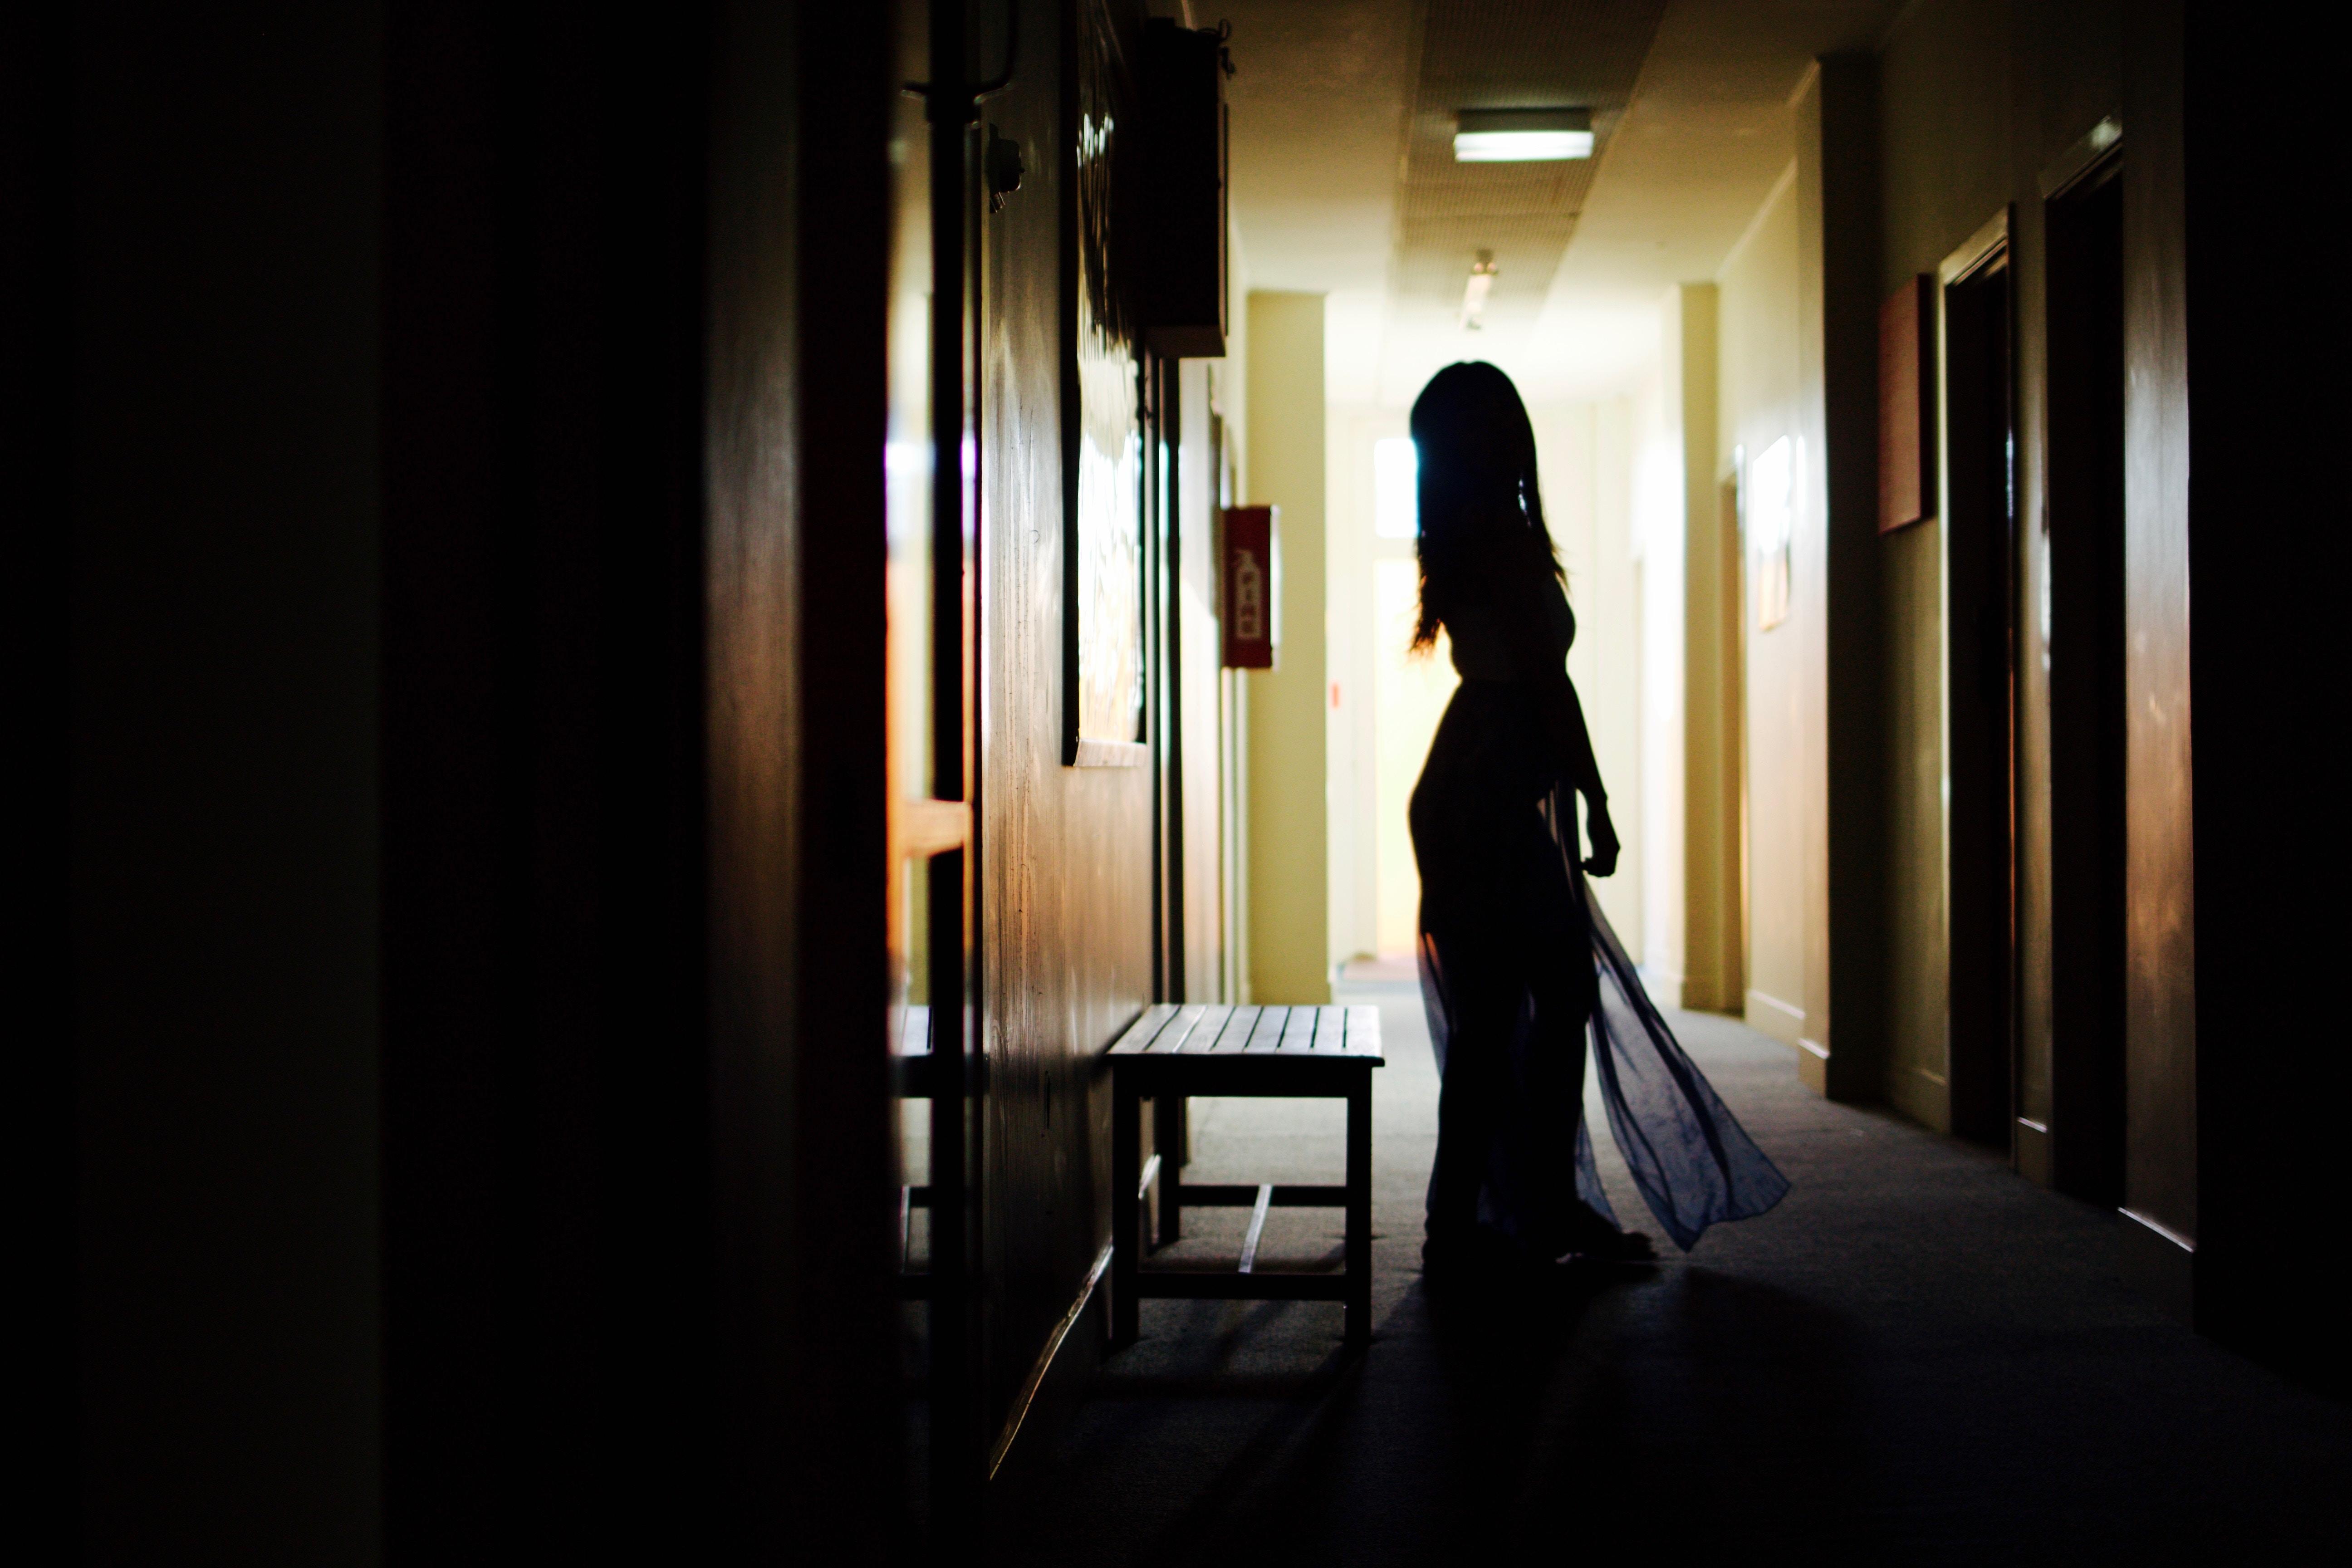 A silhouette of a woman in a dress in a dark corridor